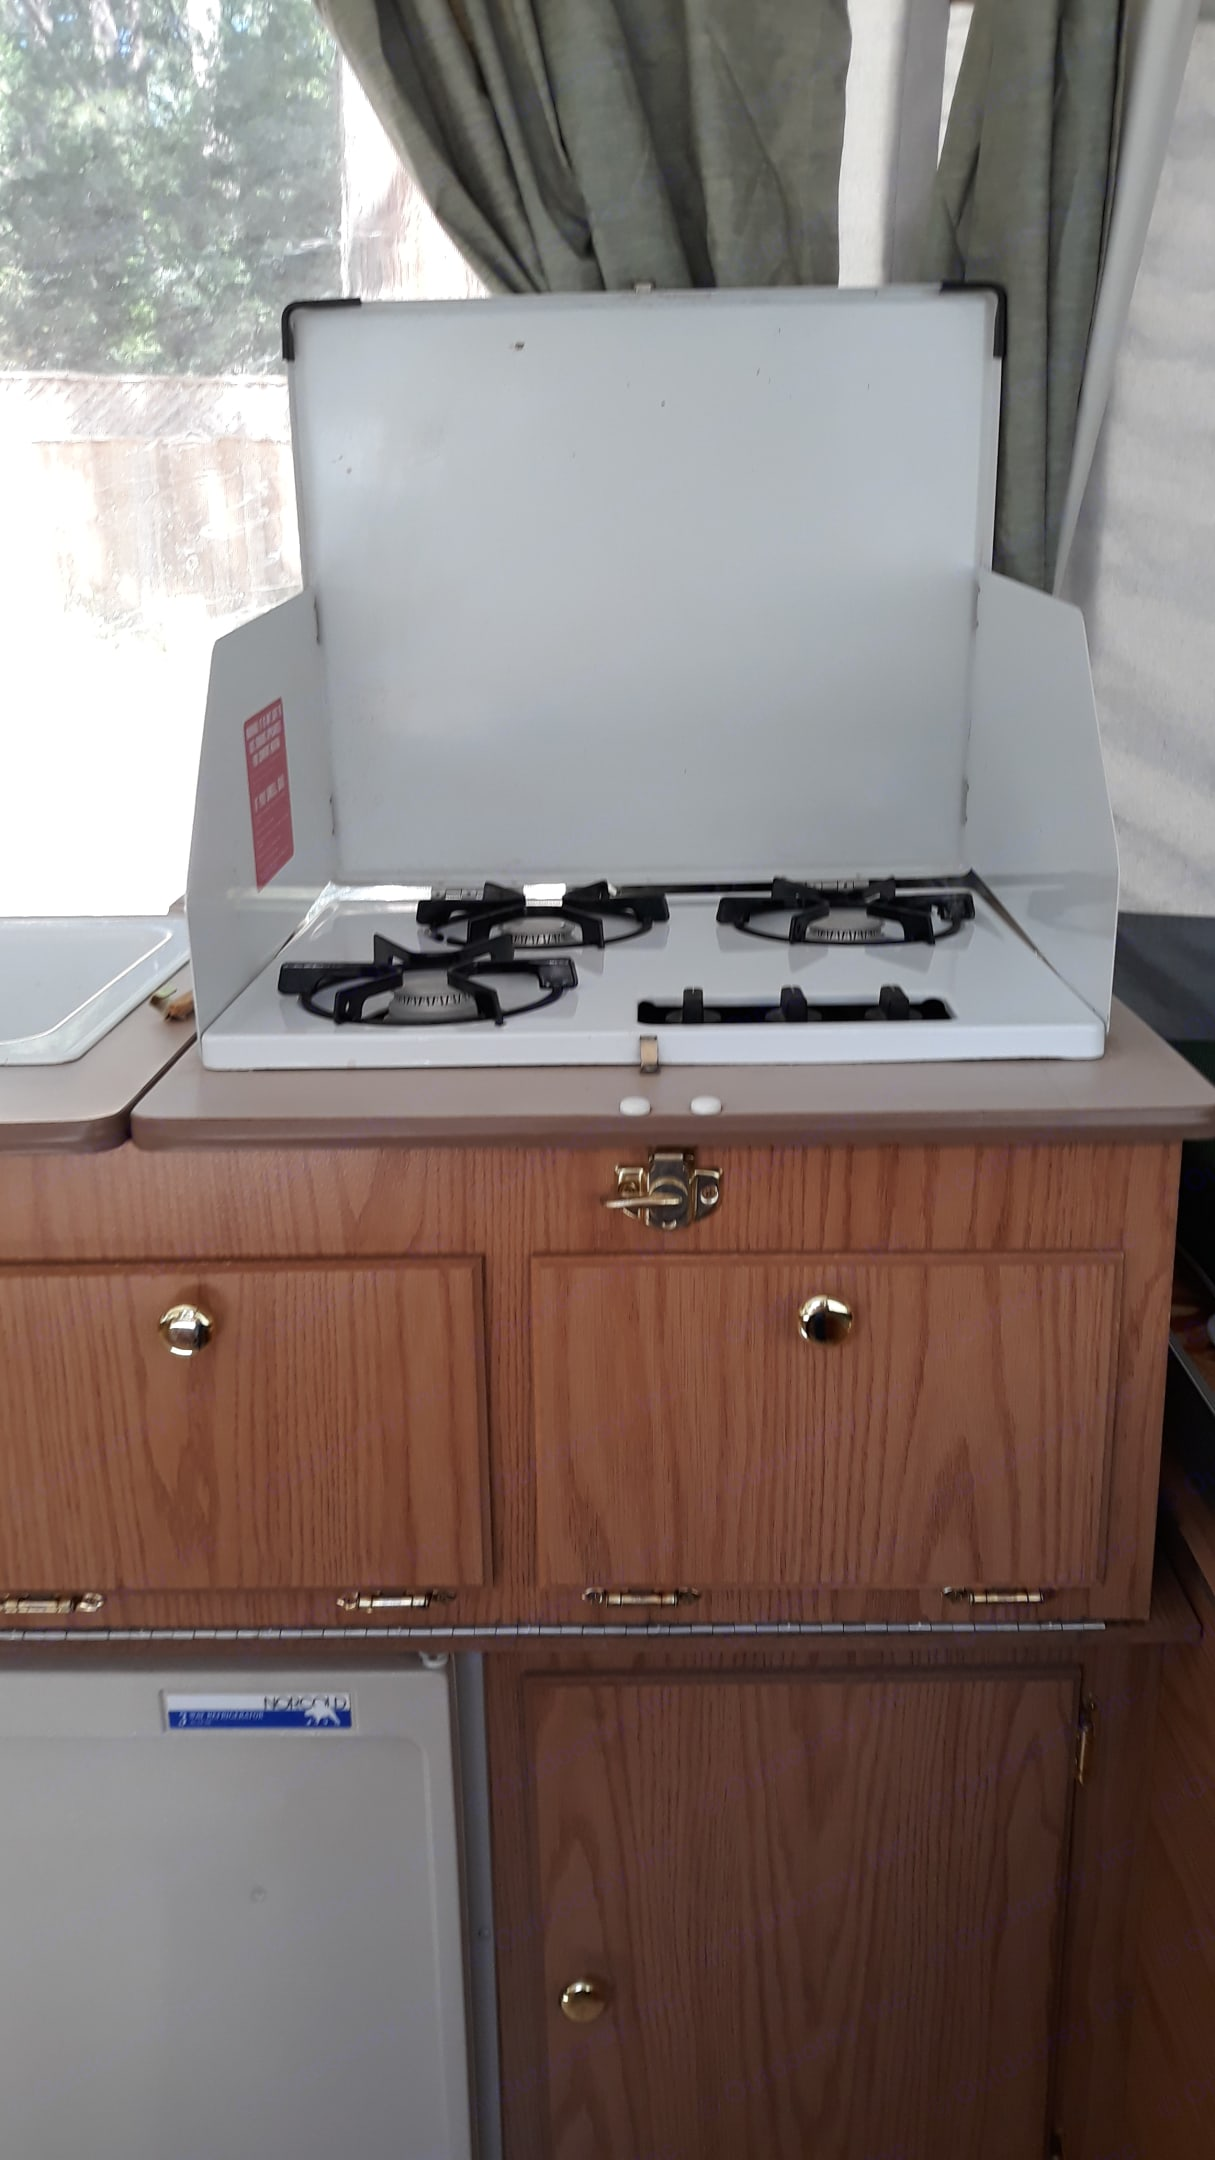 The three burner propane stove. . Coleman Fairview 2000